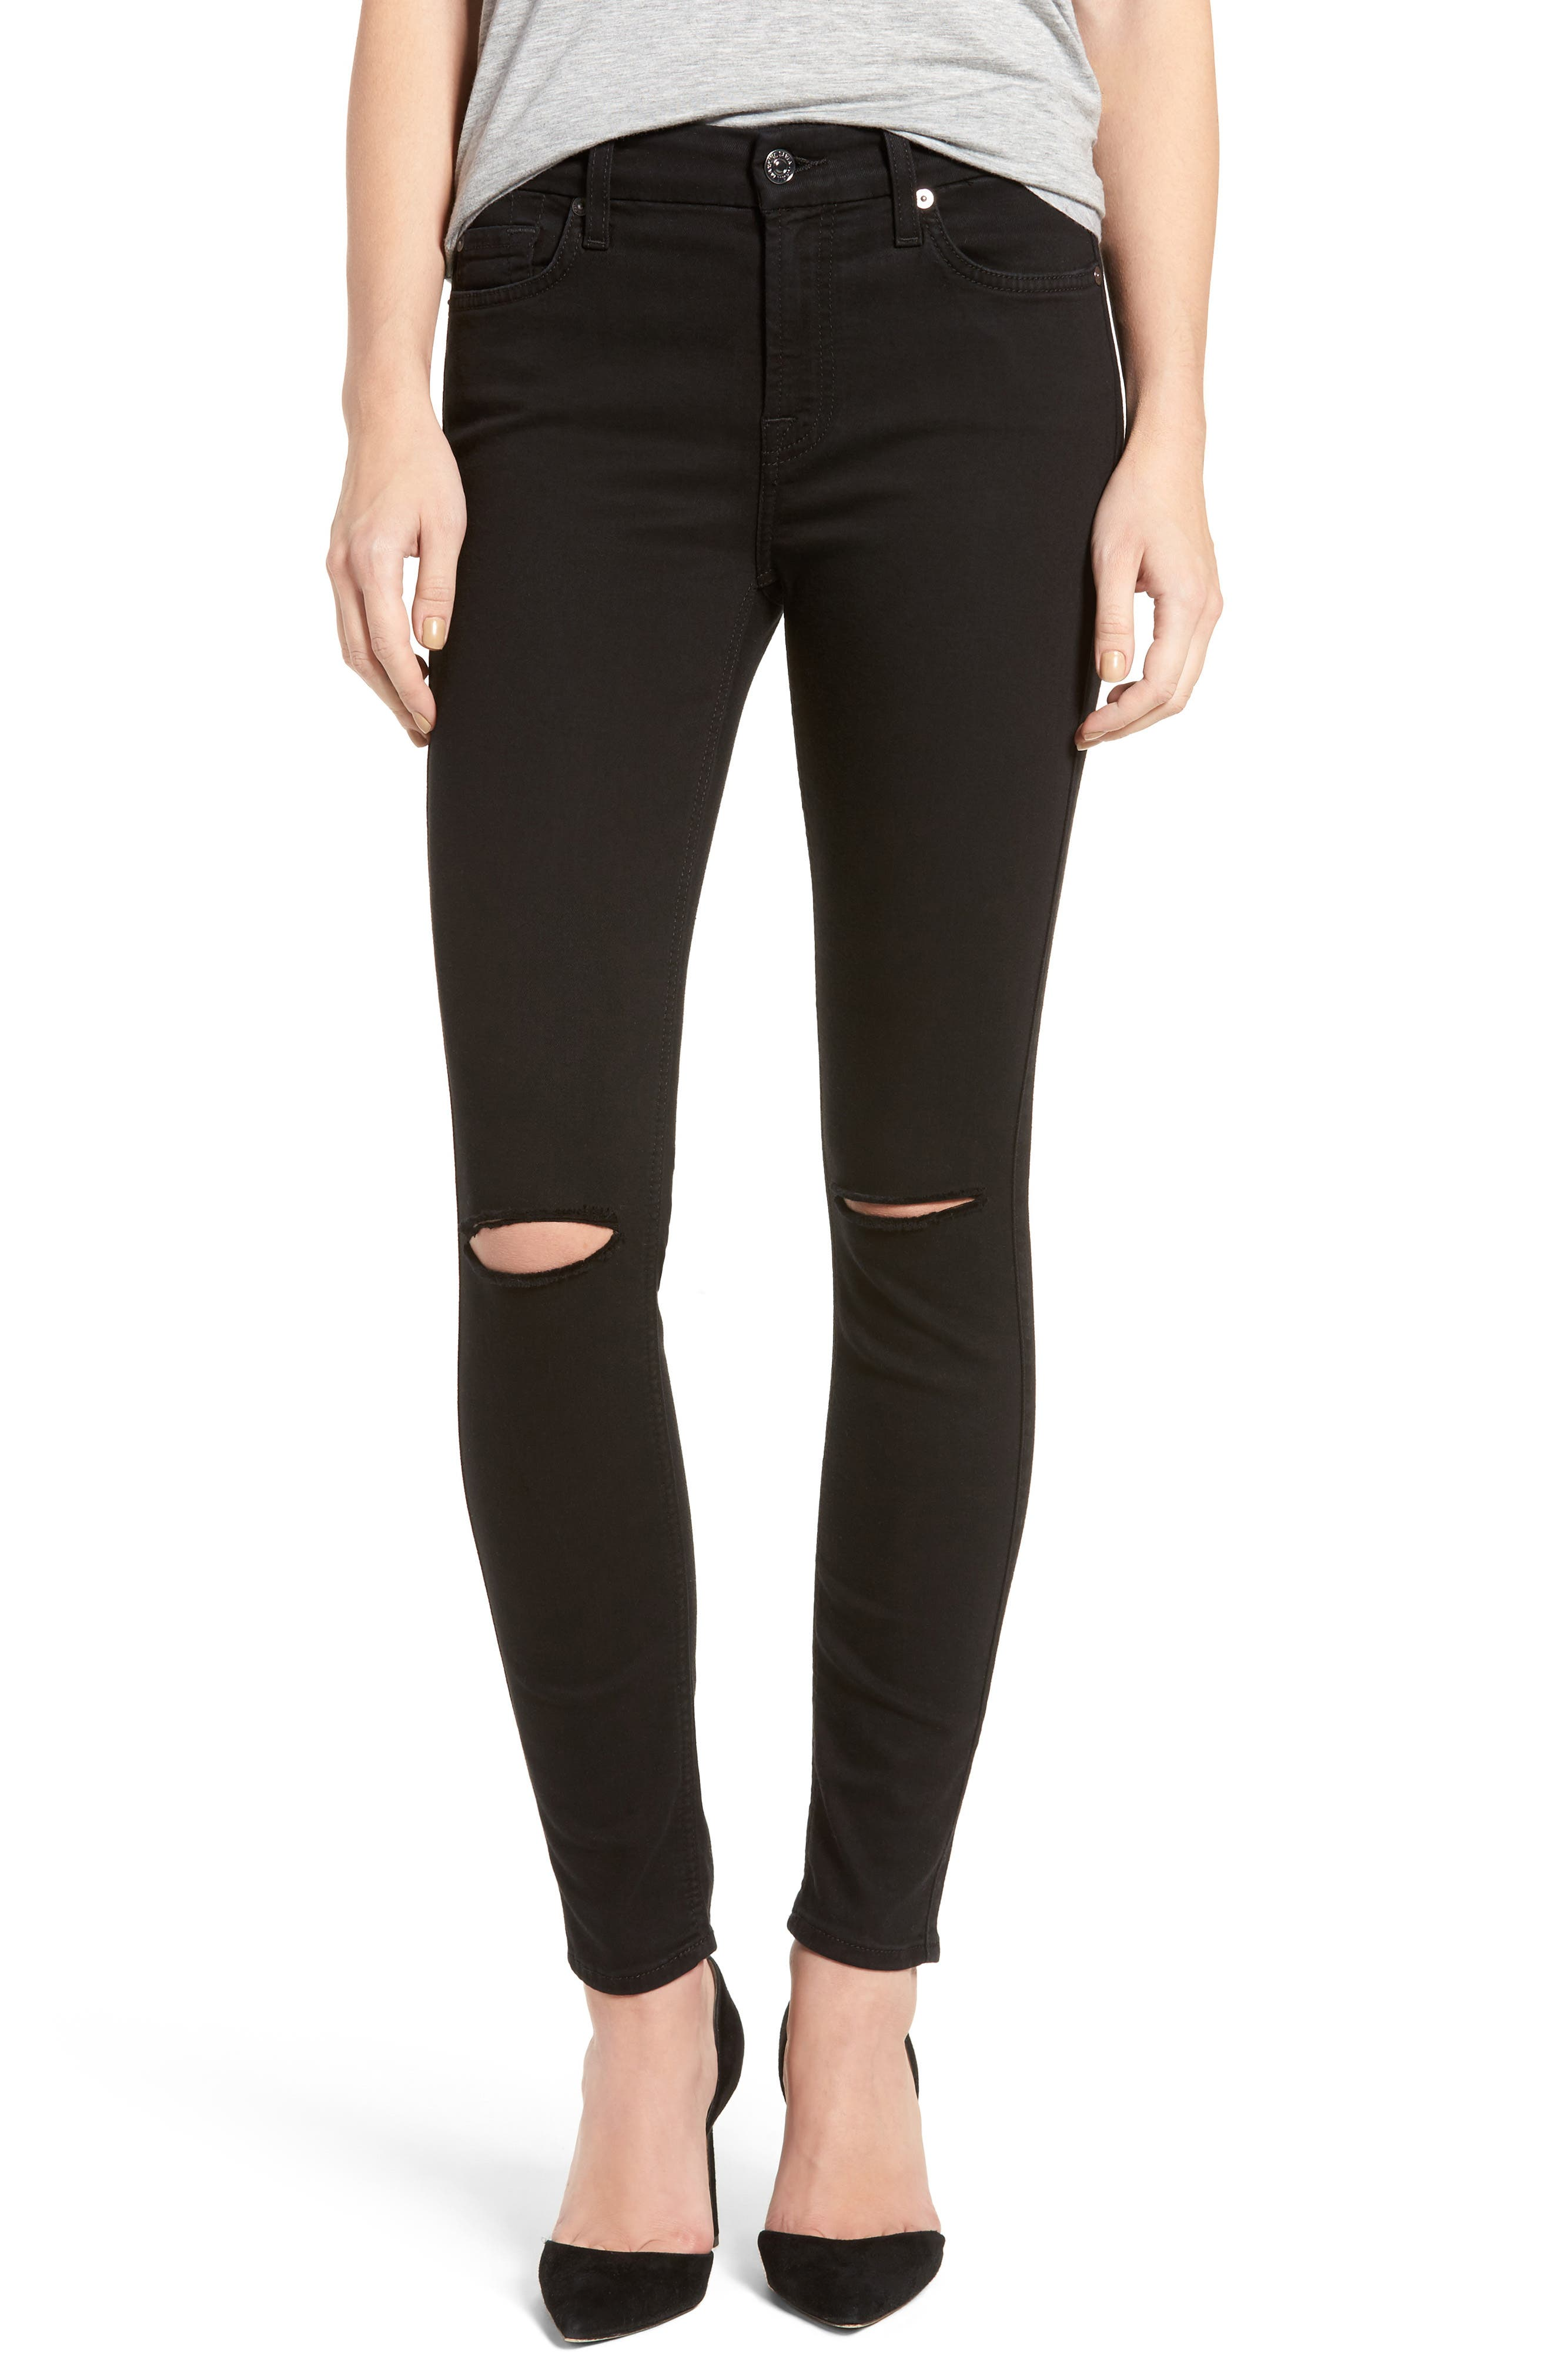 b(air) Ankle Skinny Jeans,                         Main,                         color, BAIR BLACK 2